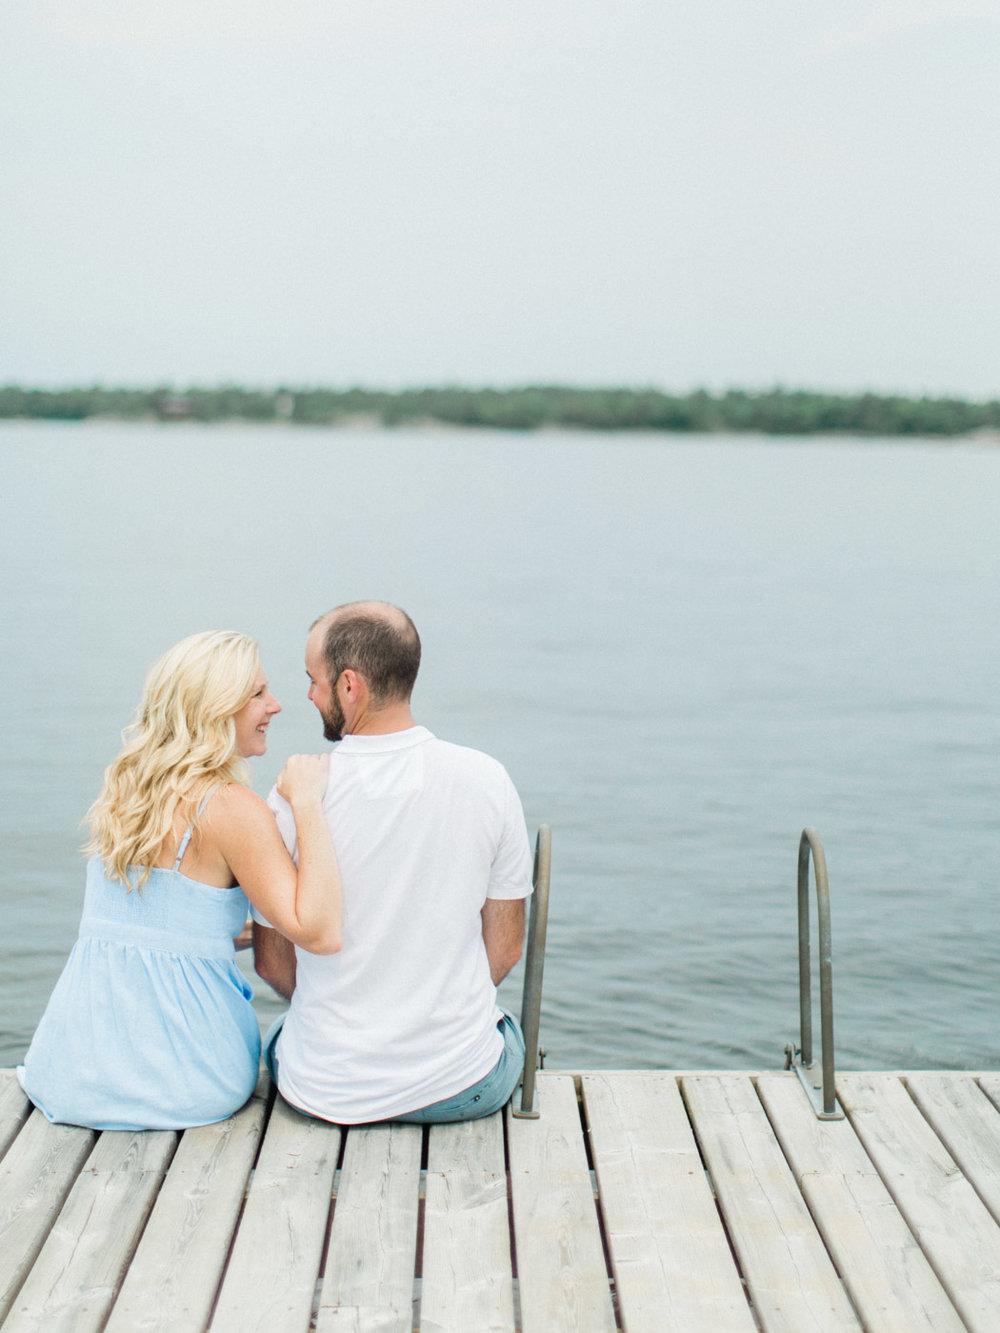 toronto_wedding_photographer_fine_art_documentary_Muskoka_Engagement_Honey_Harbour-41.jpg